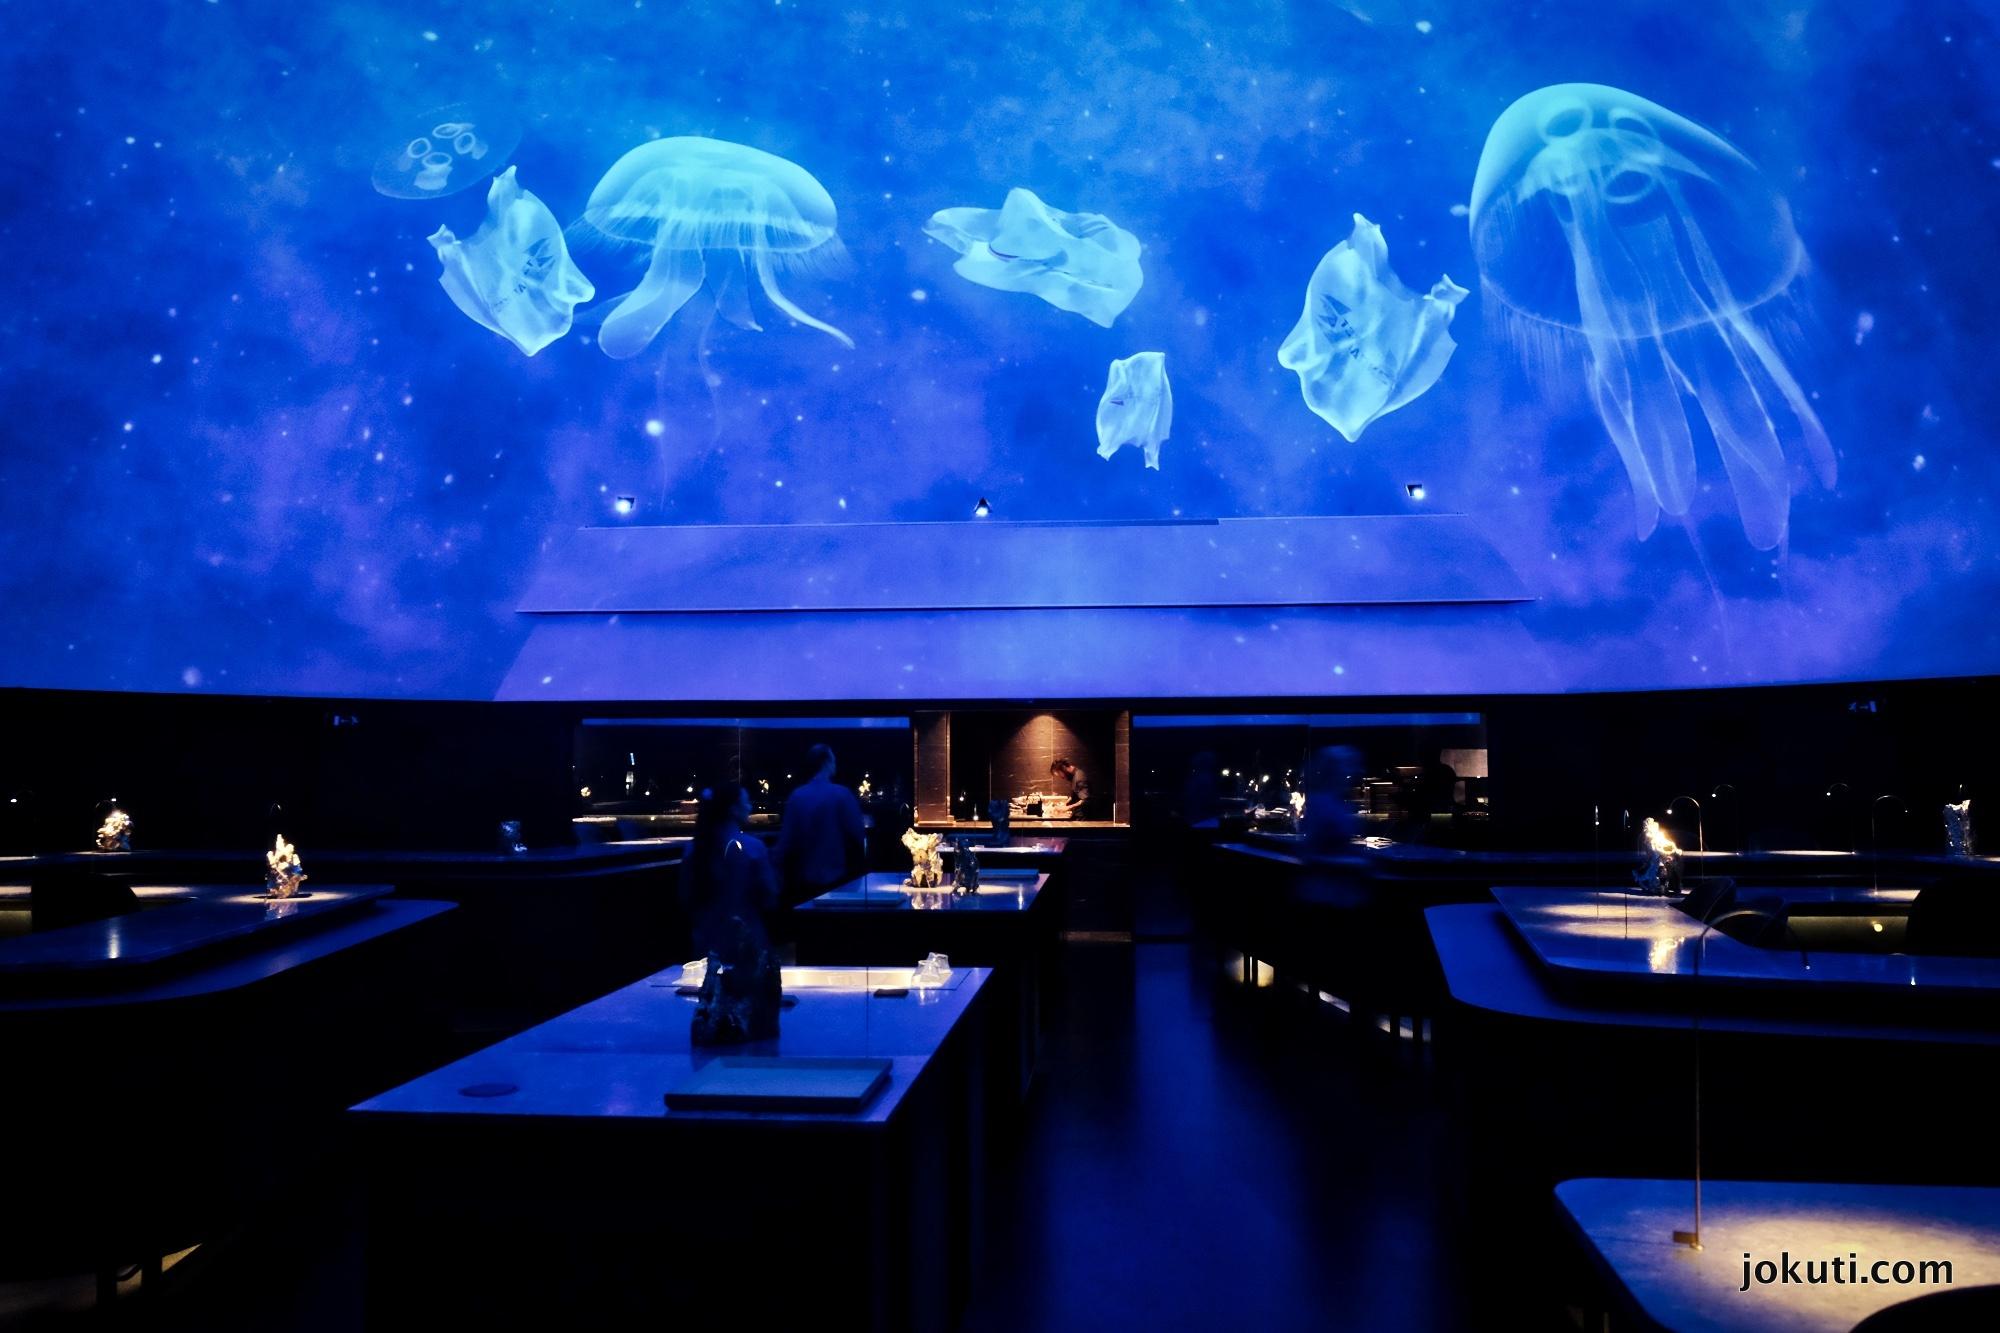 dscf7200_alchemist_copenhagen_rasmus_munk_holistic_dining_restaurant_denmark_vilagevo_jokuti_andras_l.jpg